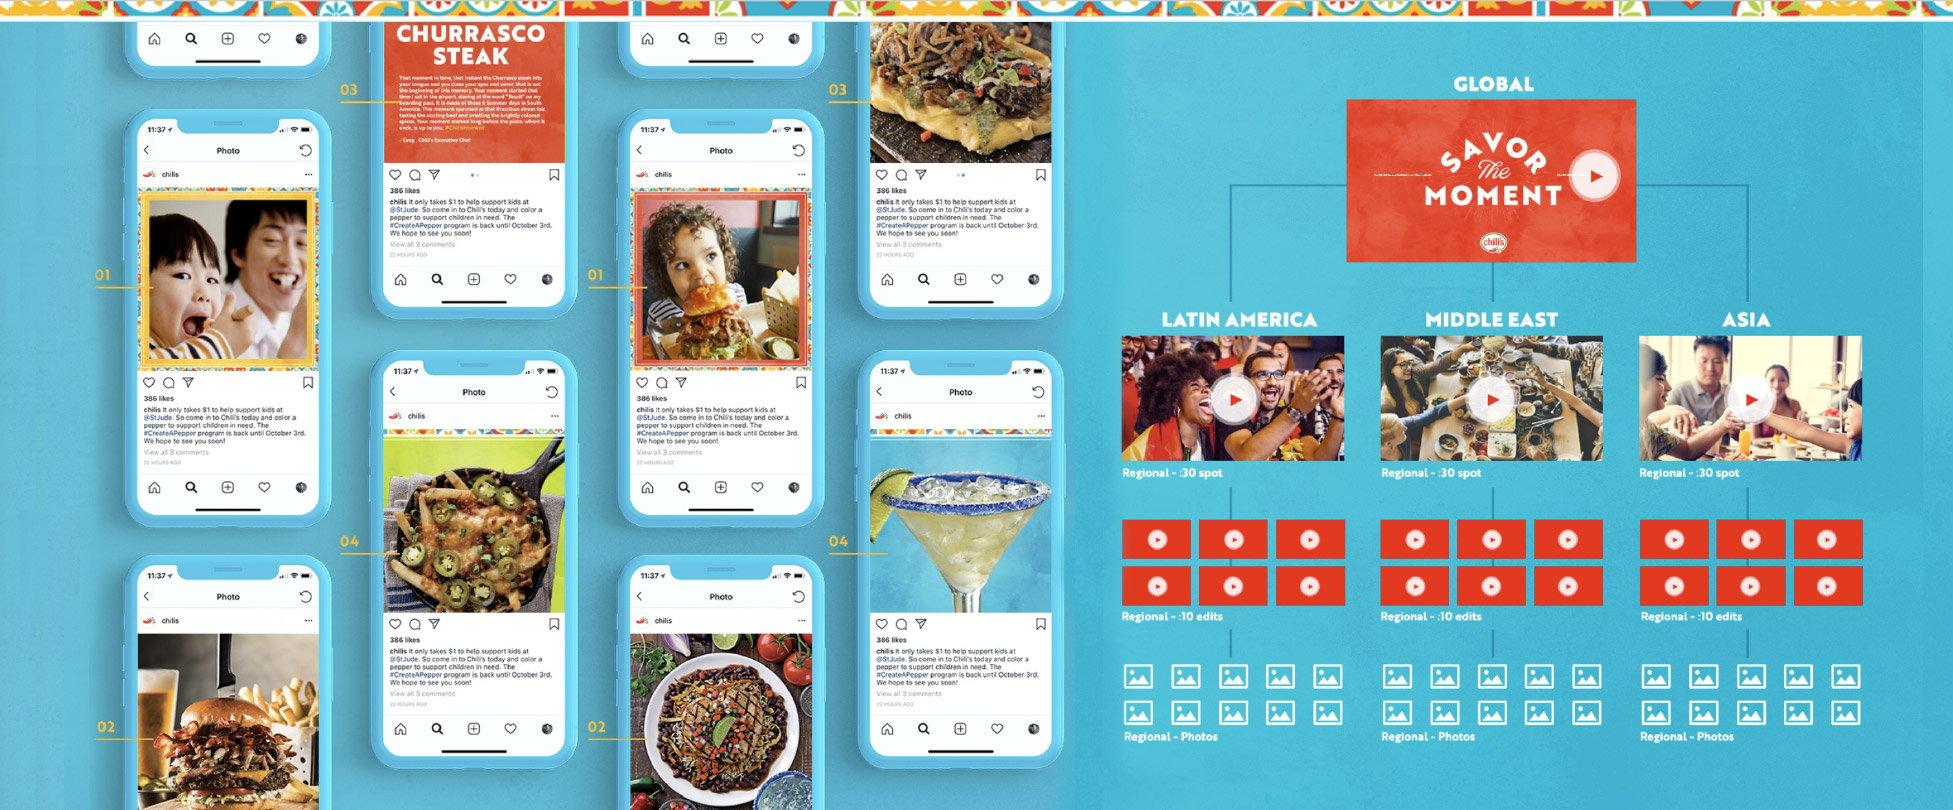 restaurant digital marketing strategy